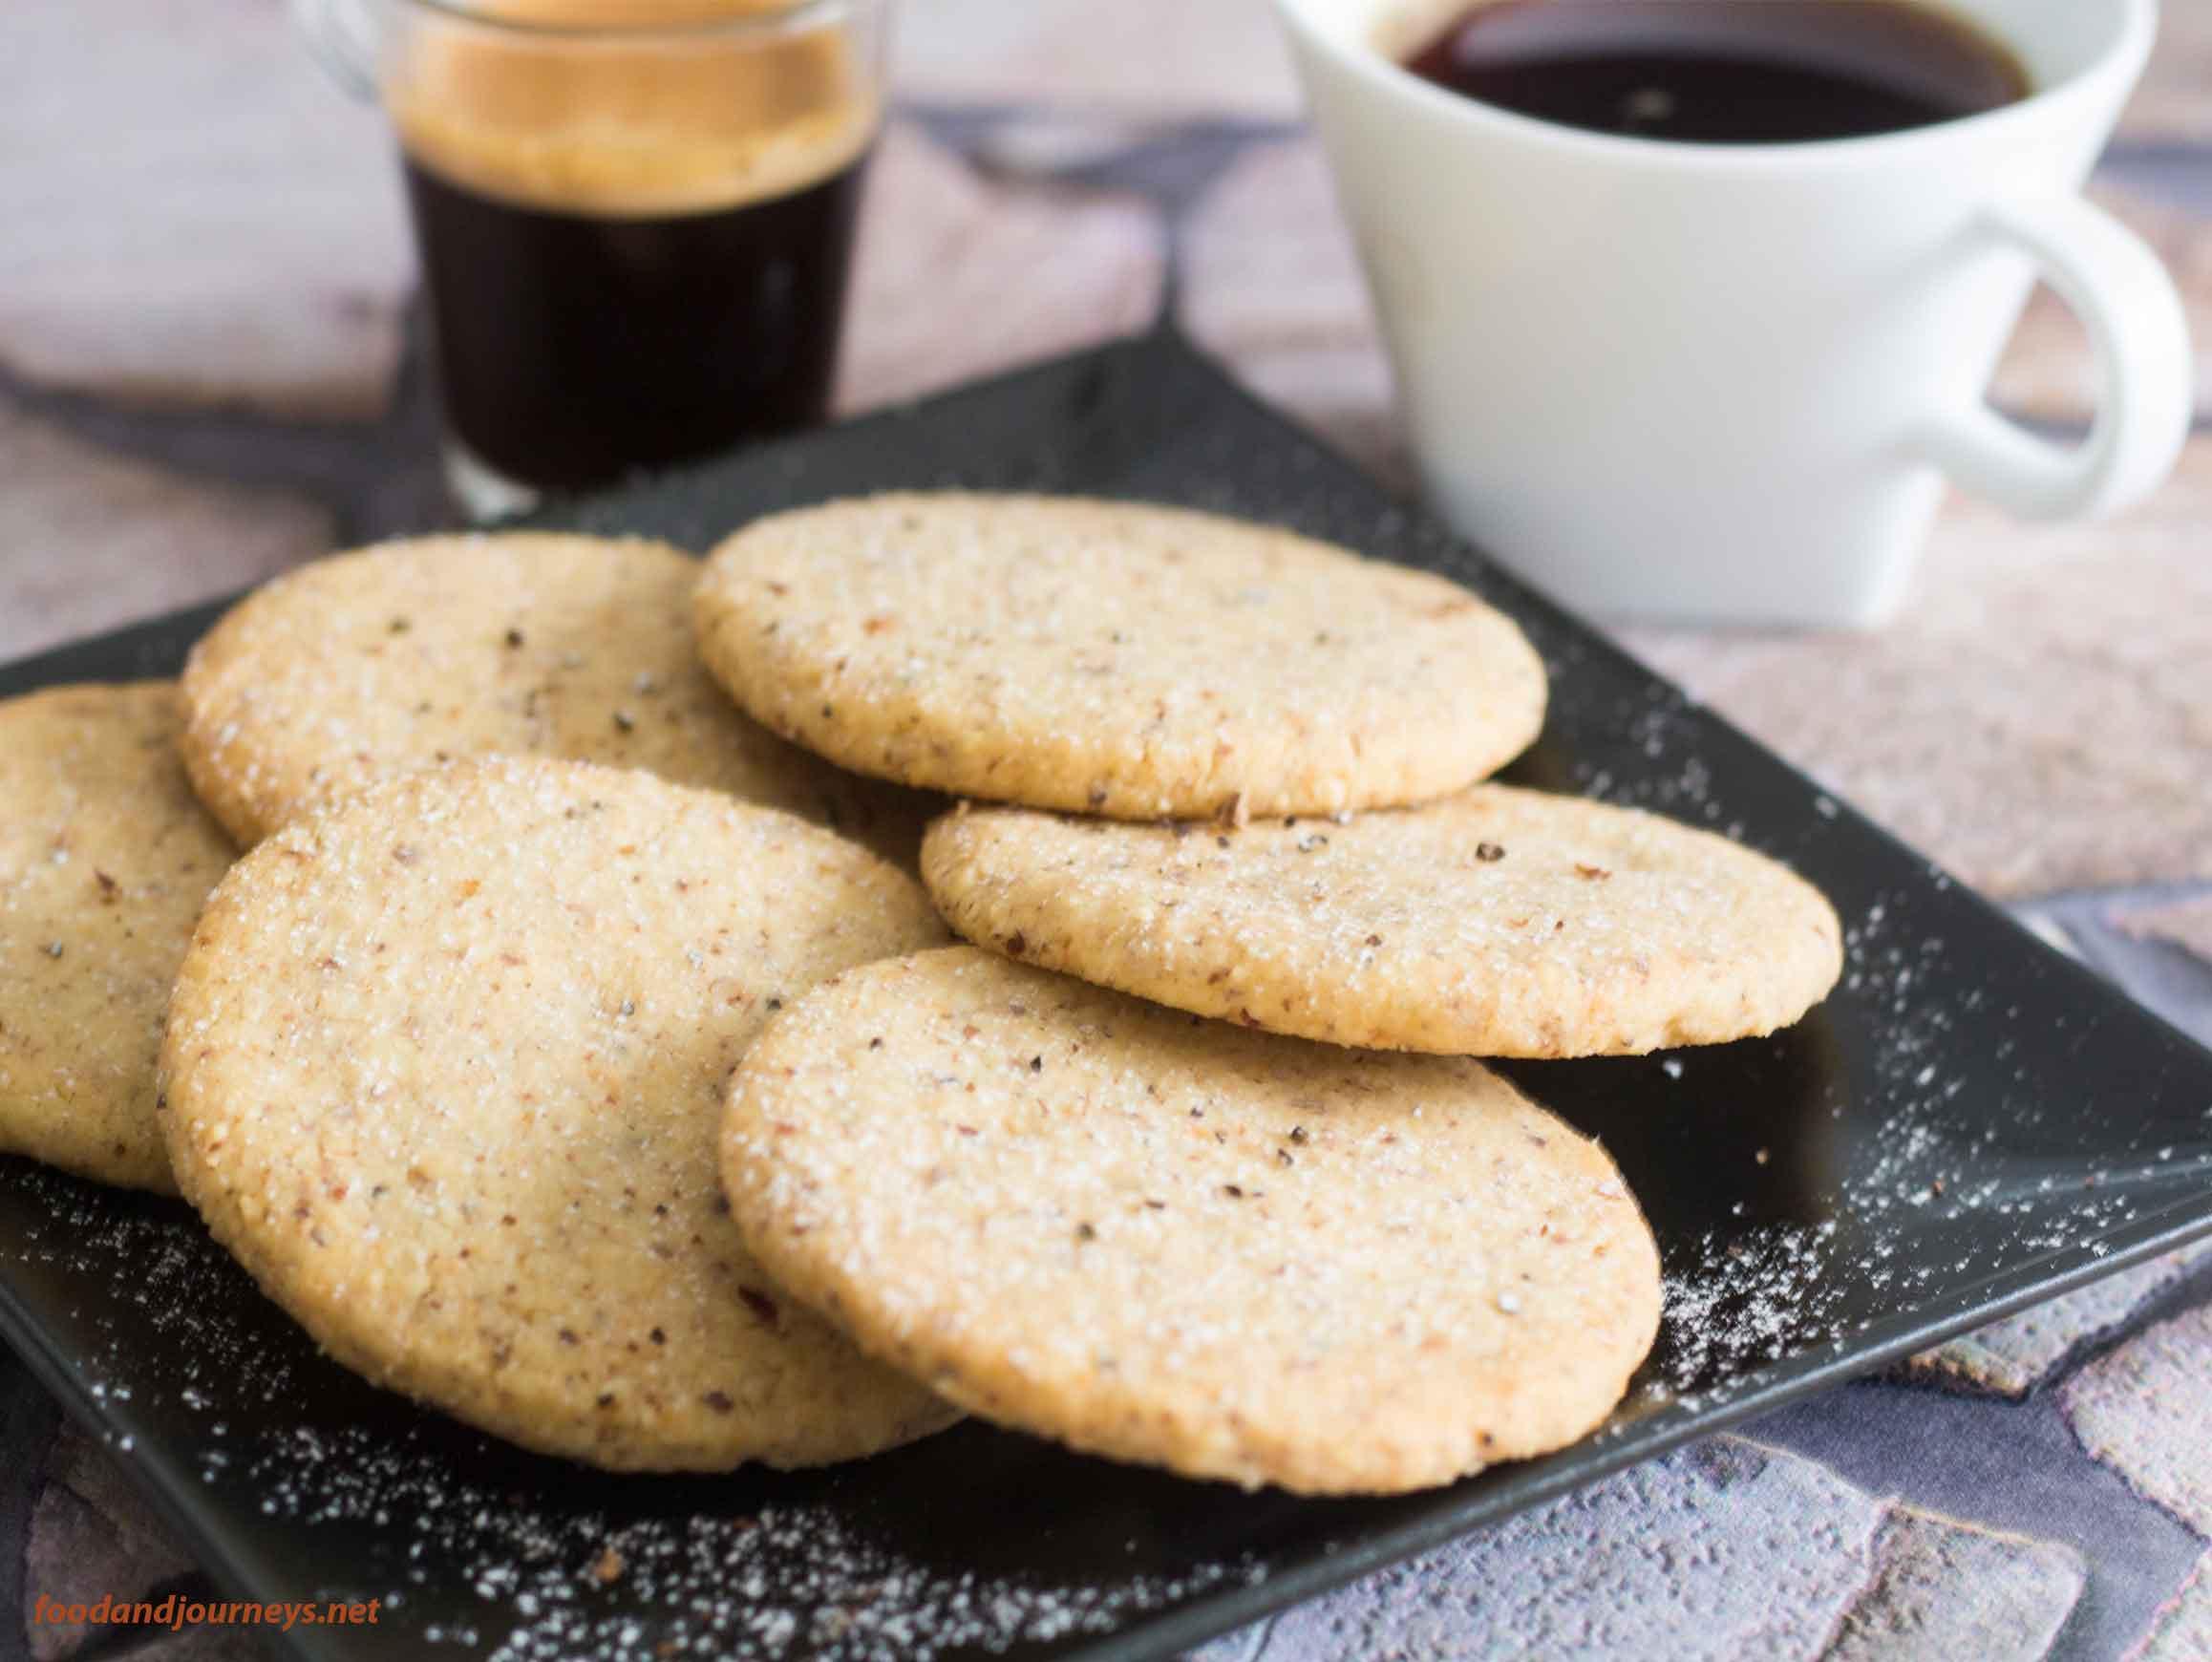 Serving of Swedish Hazelnut & Cardamom Cookies for snack